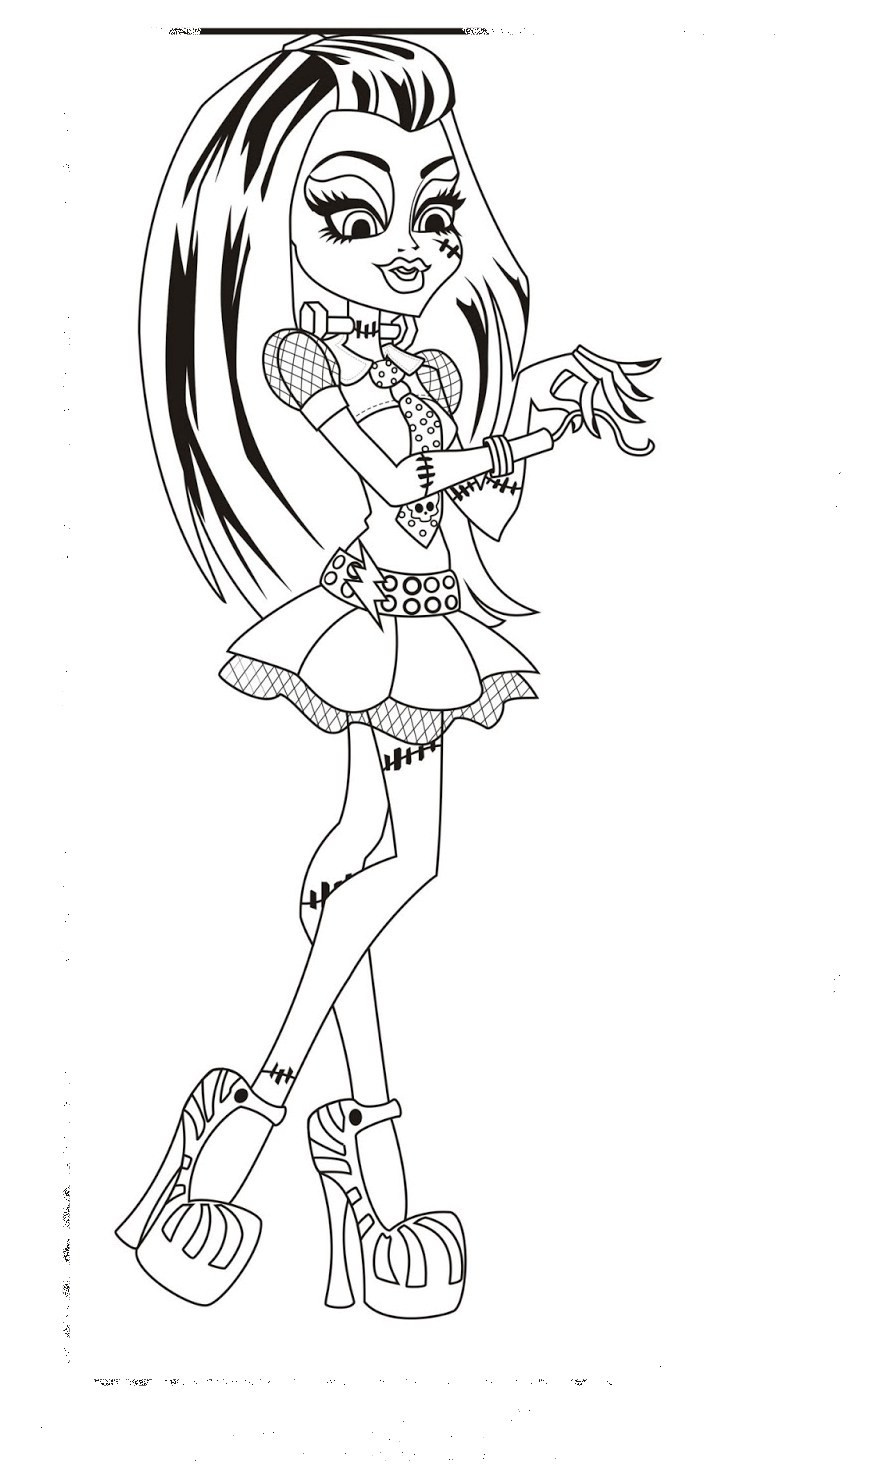 Monster High Malvorlagen Genial Ausmalbilder Monster High Jinafire Genial 35 Monster High Sammlung